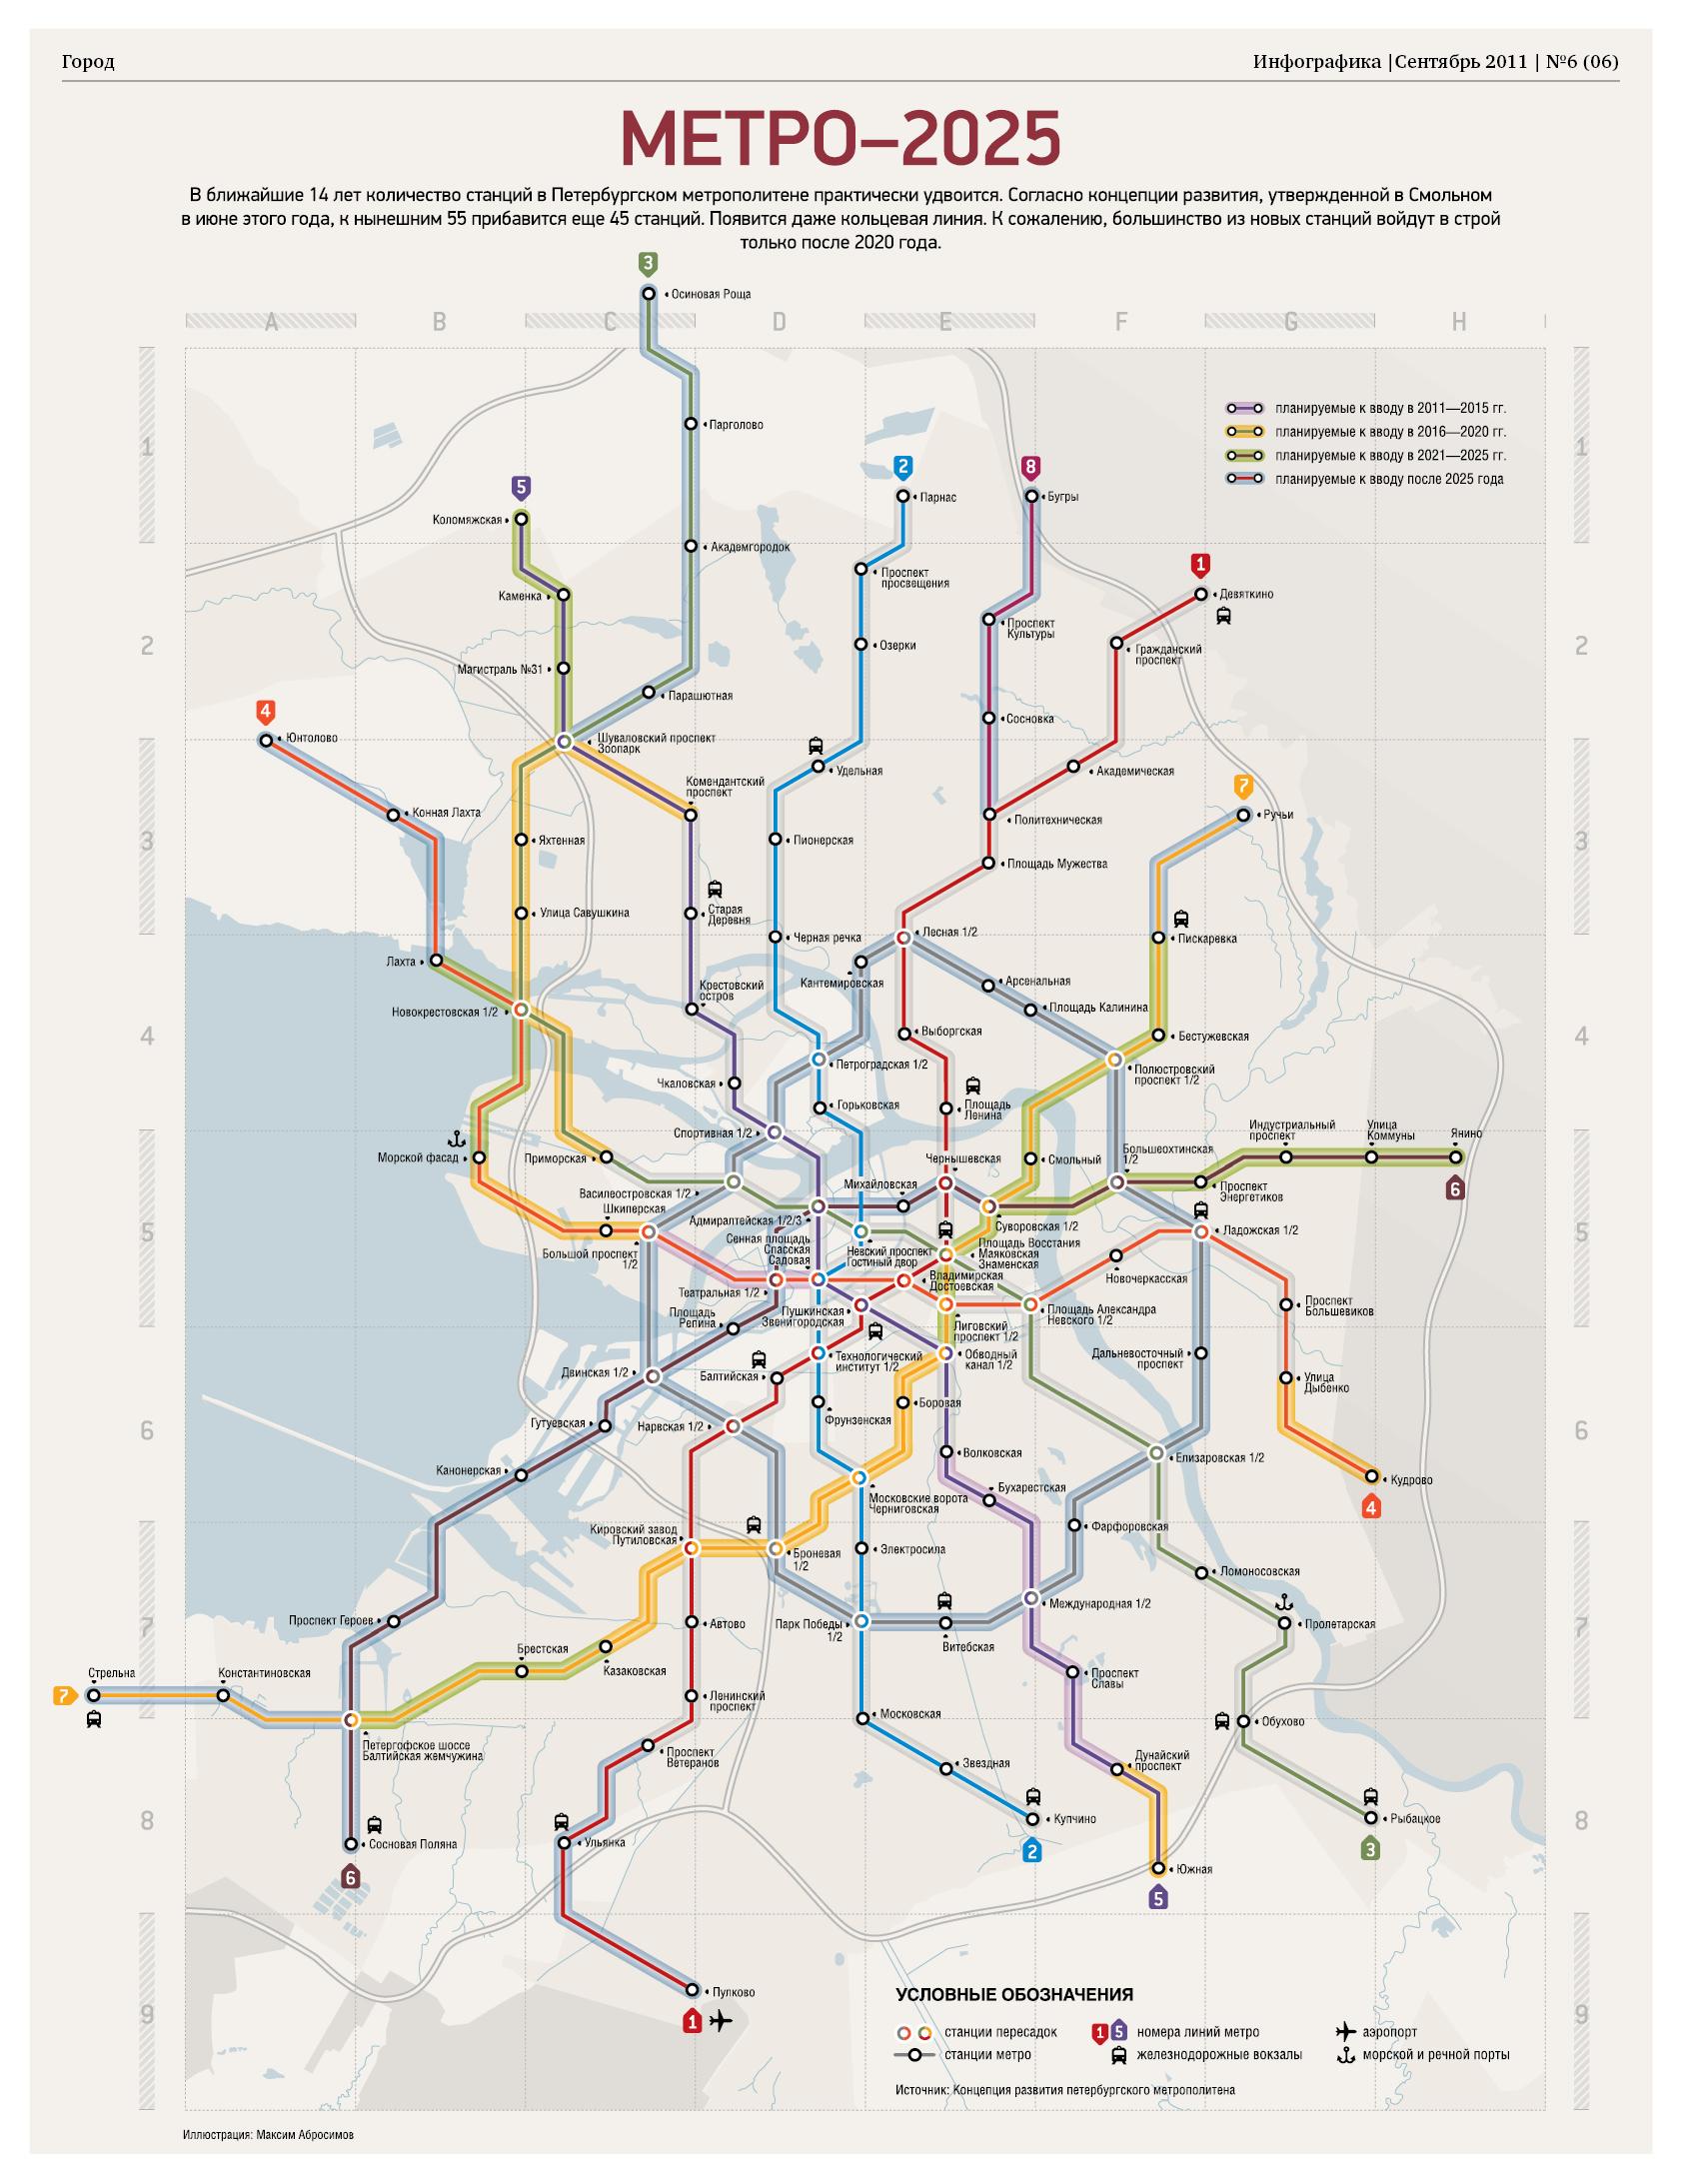 план схемы метро до 2025 москва